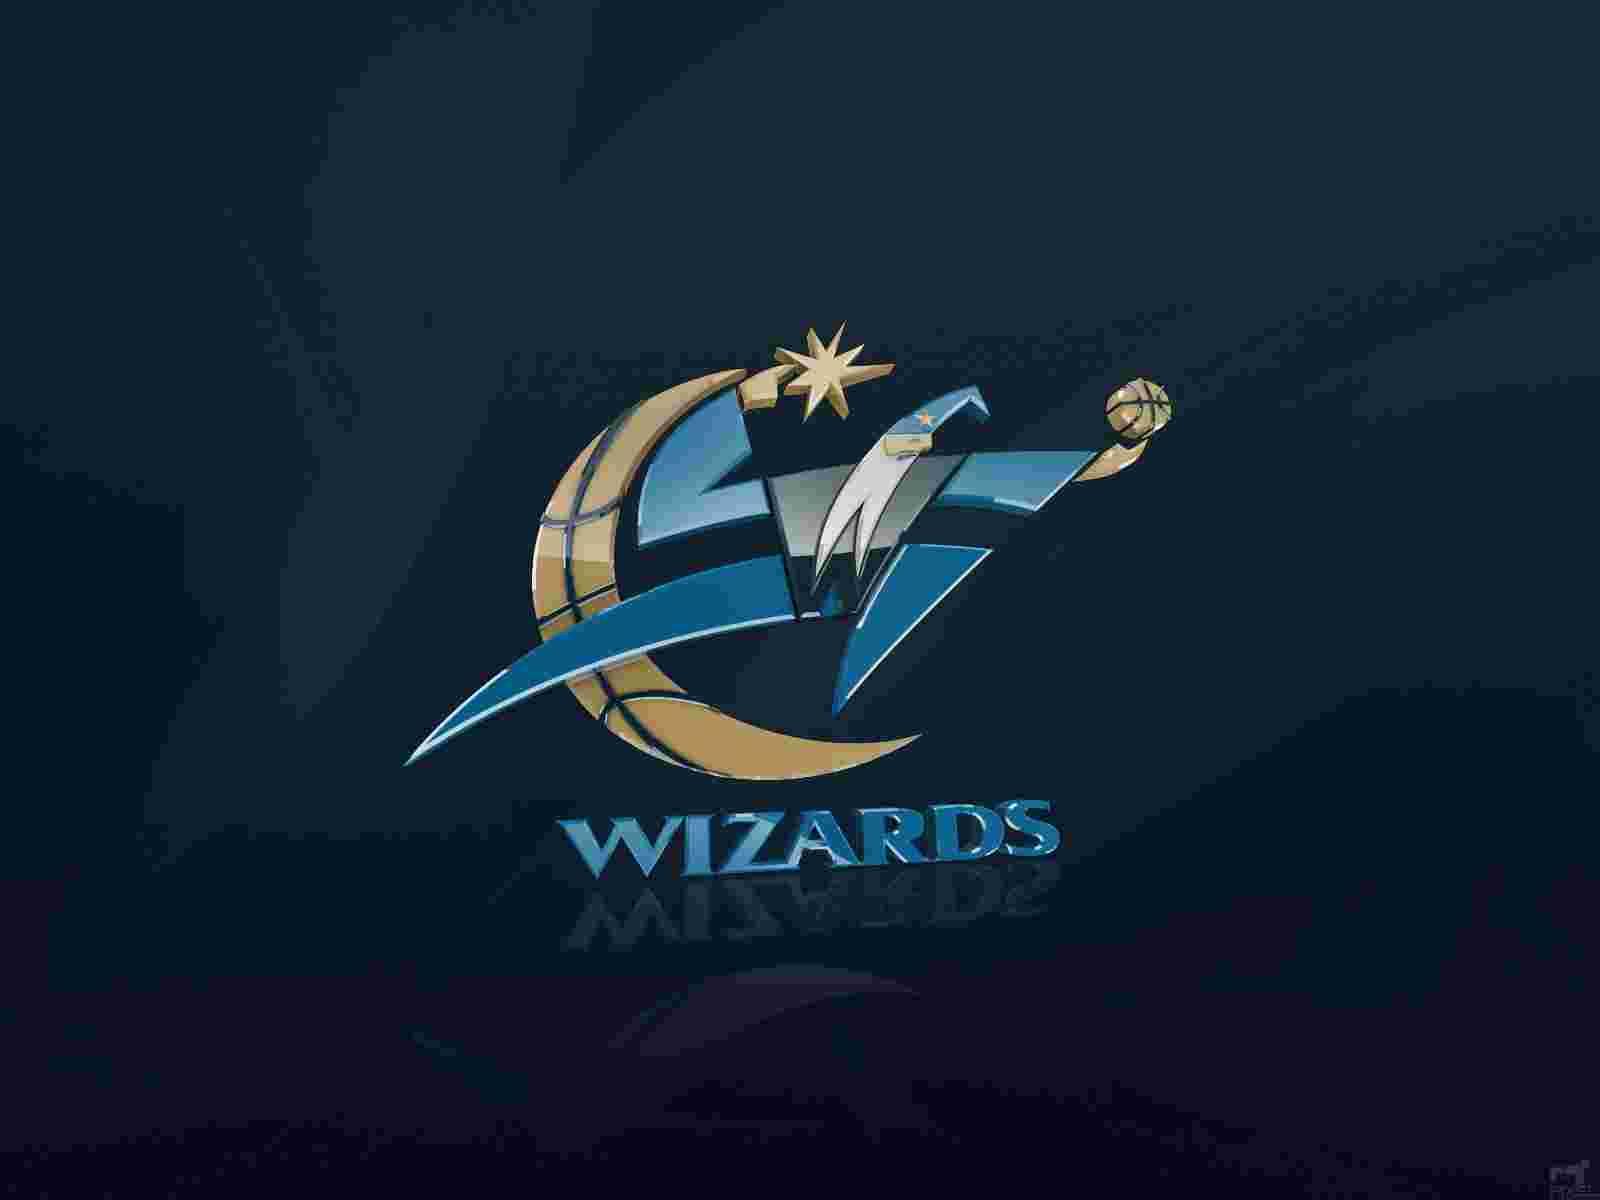 Washington Wizards logo 3D wallpapers HD